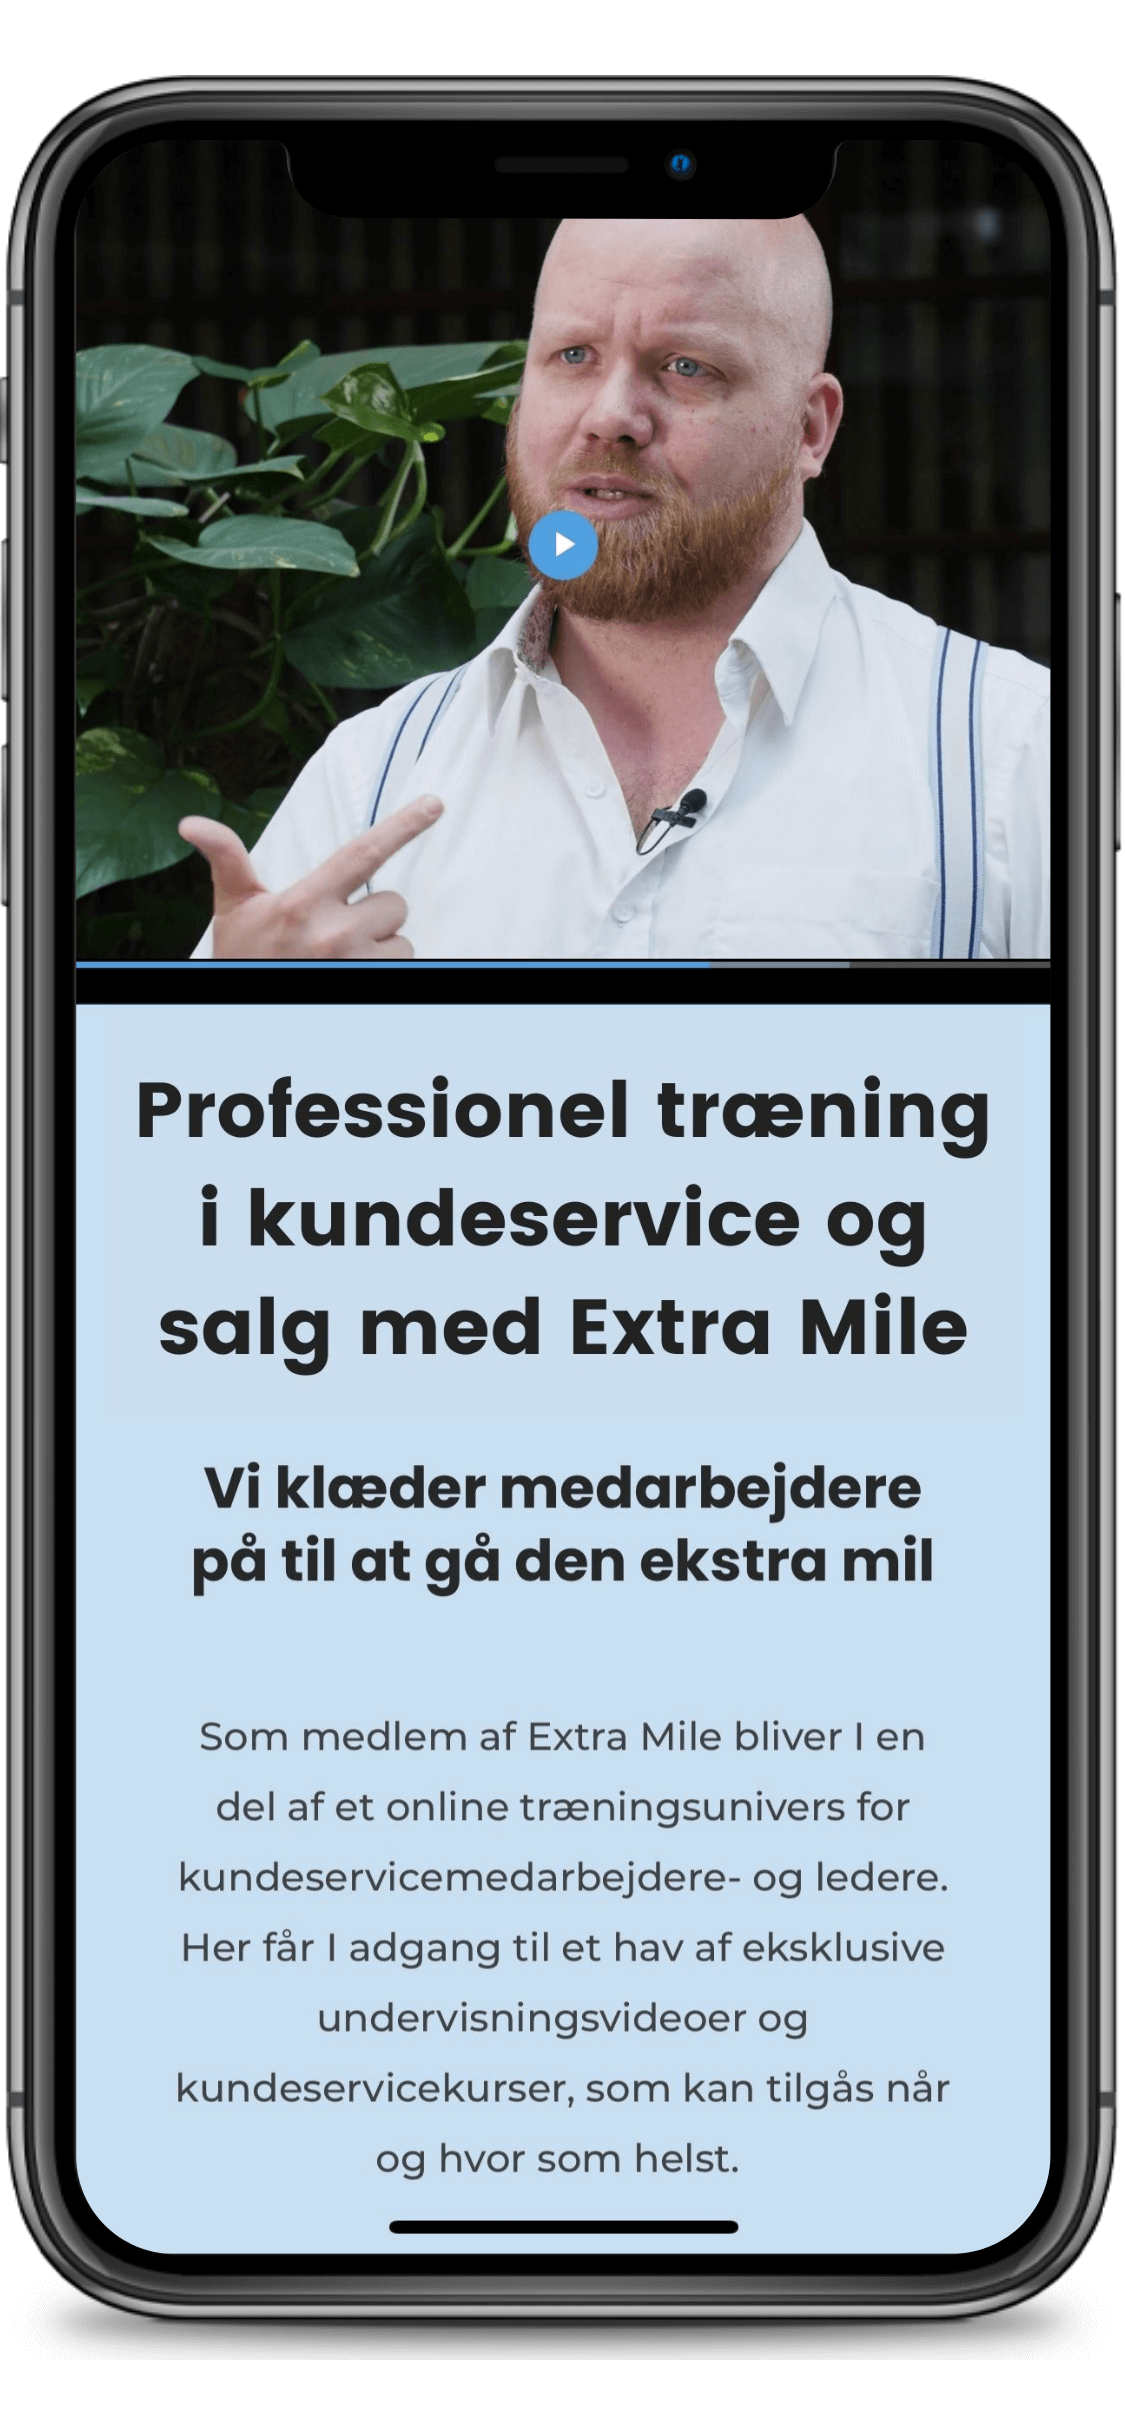 Extra Mile på mobiltelefonen